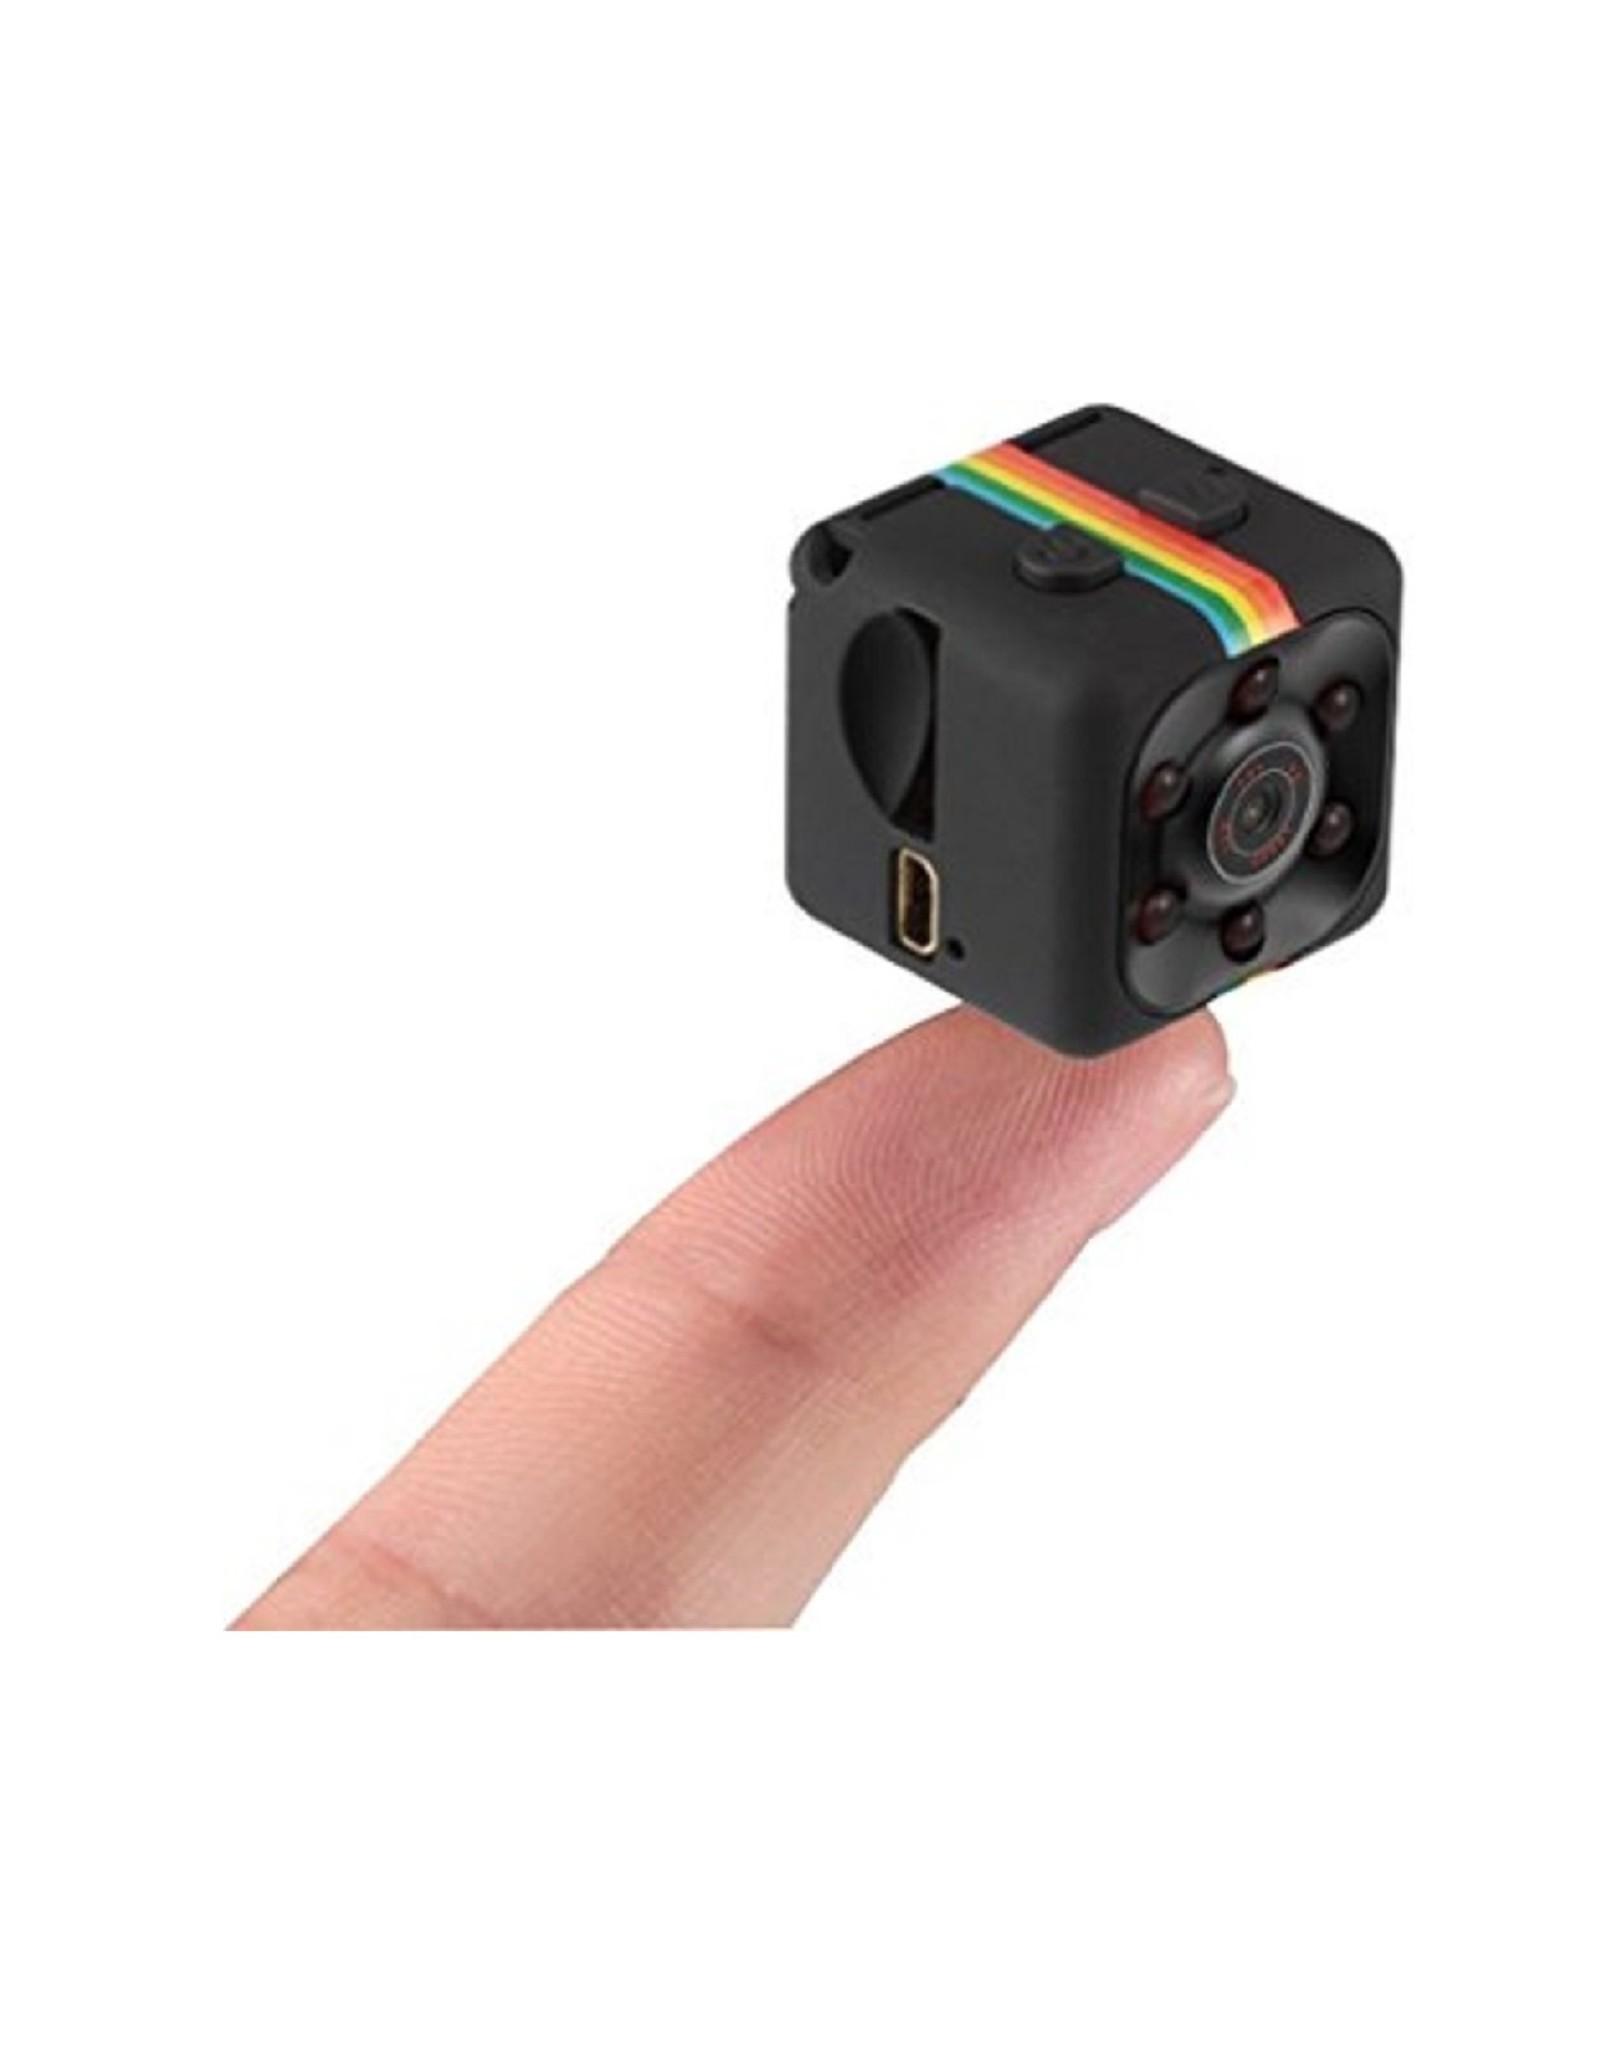 Parya Official Full HD Mini Camera - 2.3 x 2.3cm